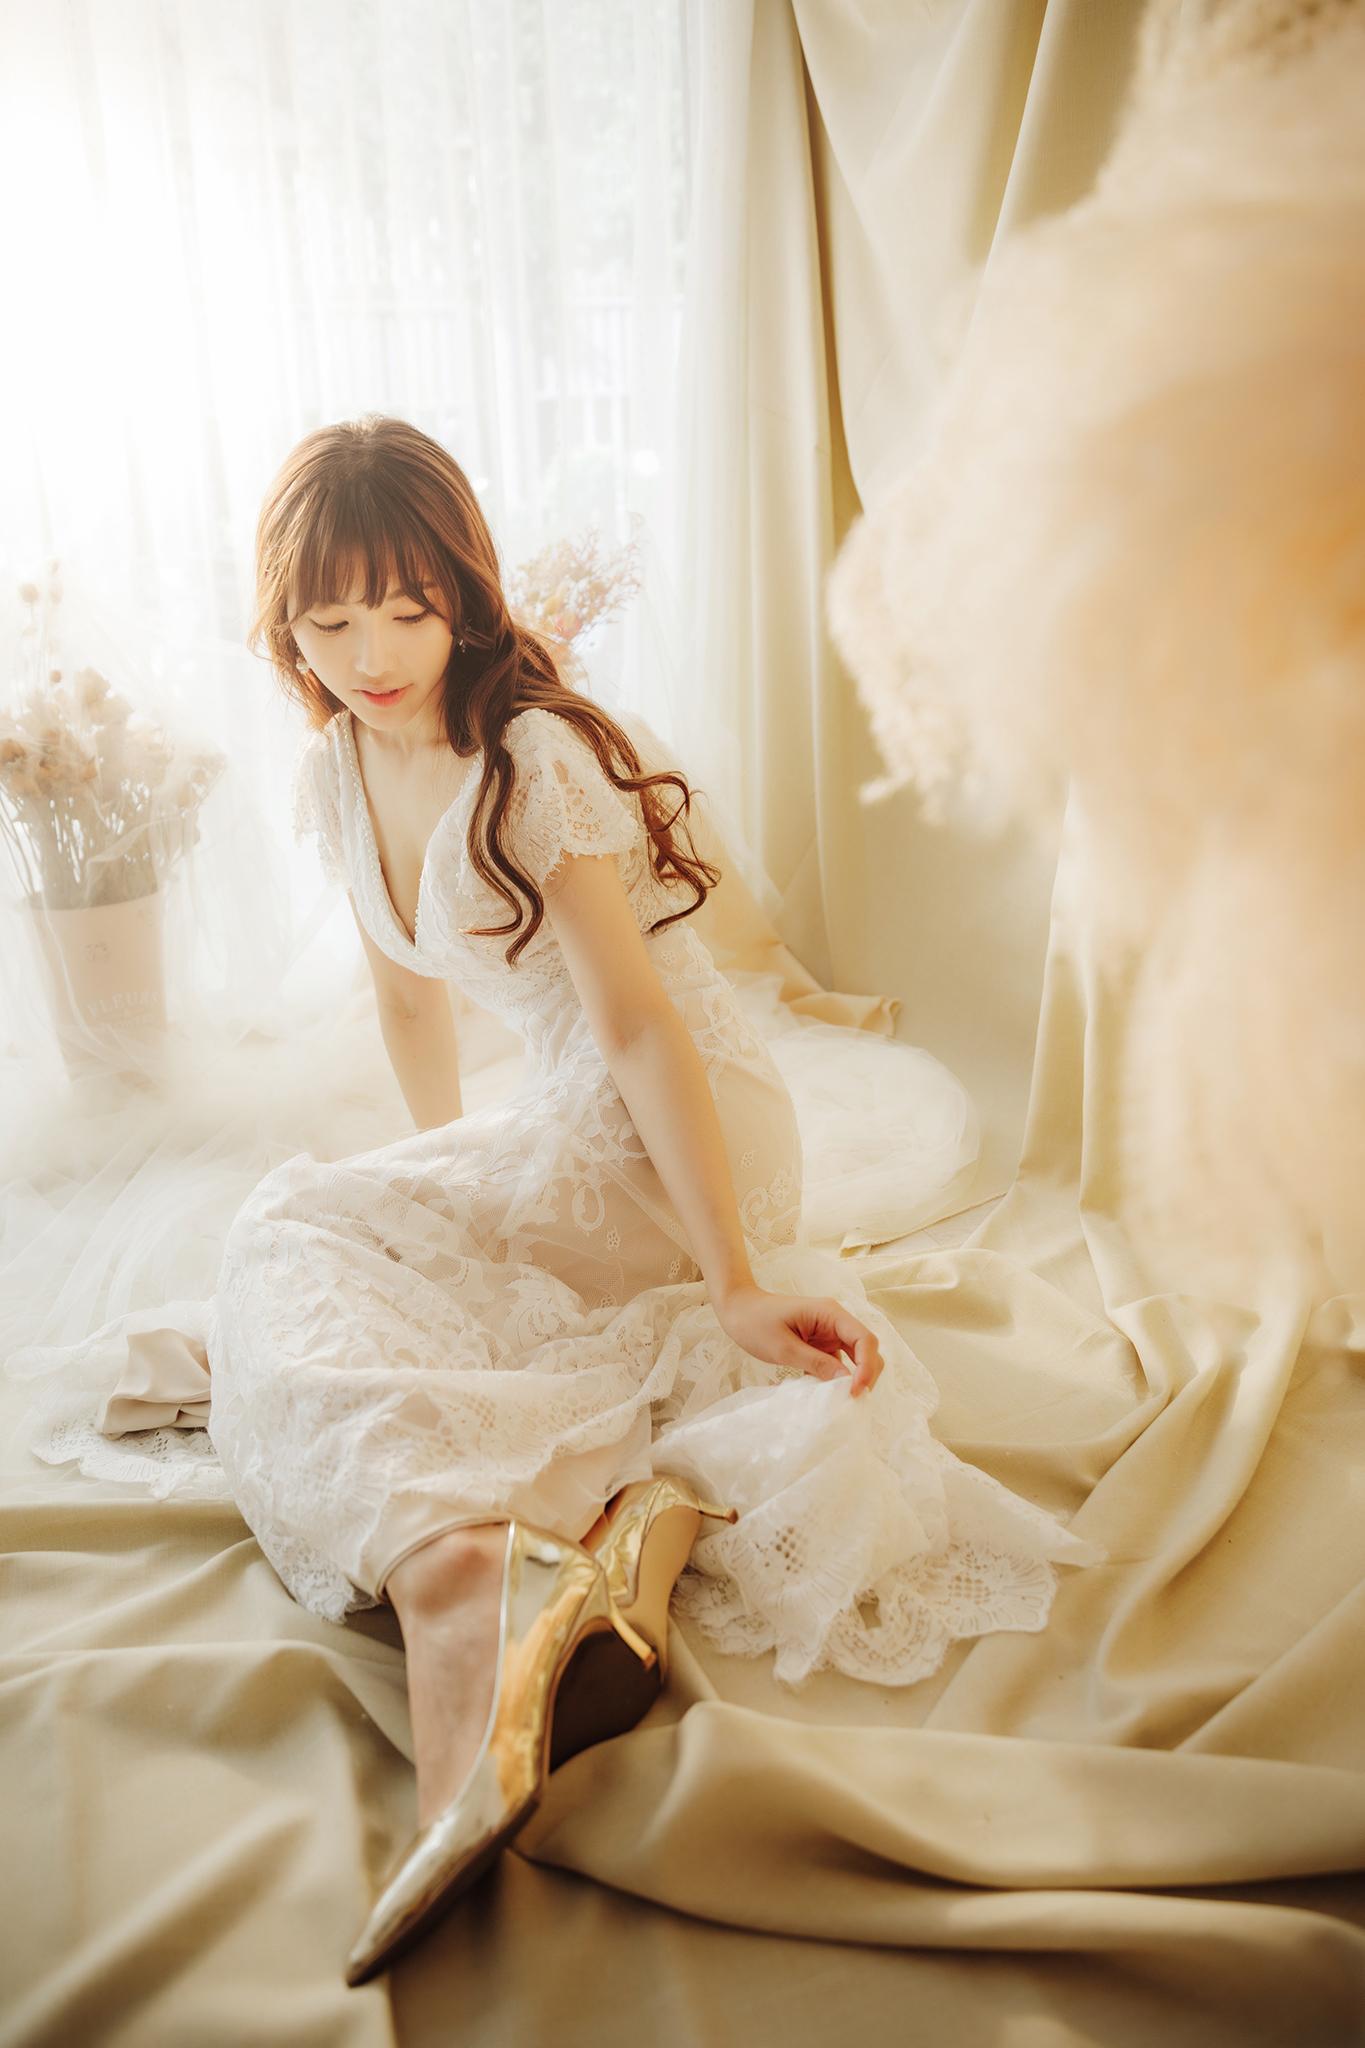 48957149827 cafb6732c1 o - 【自主婚紗】+Yu+